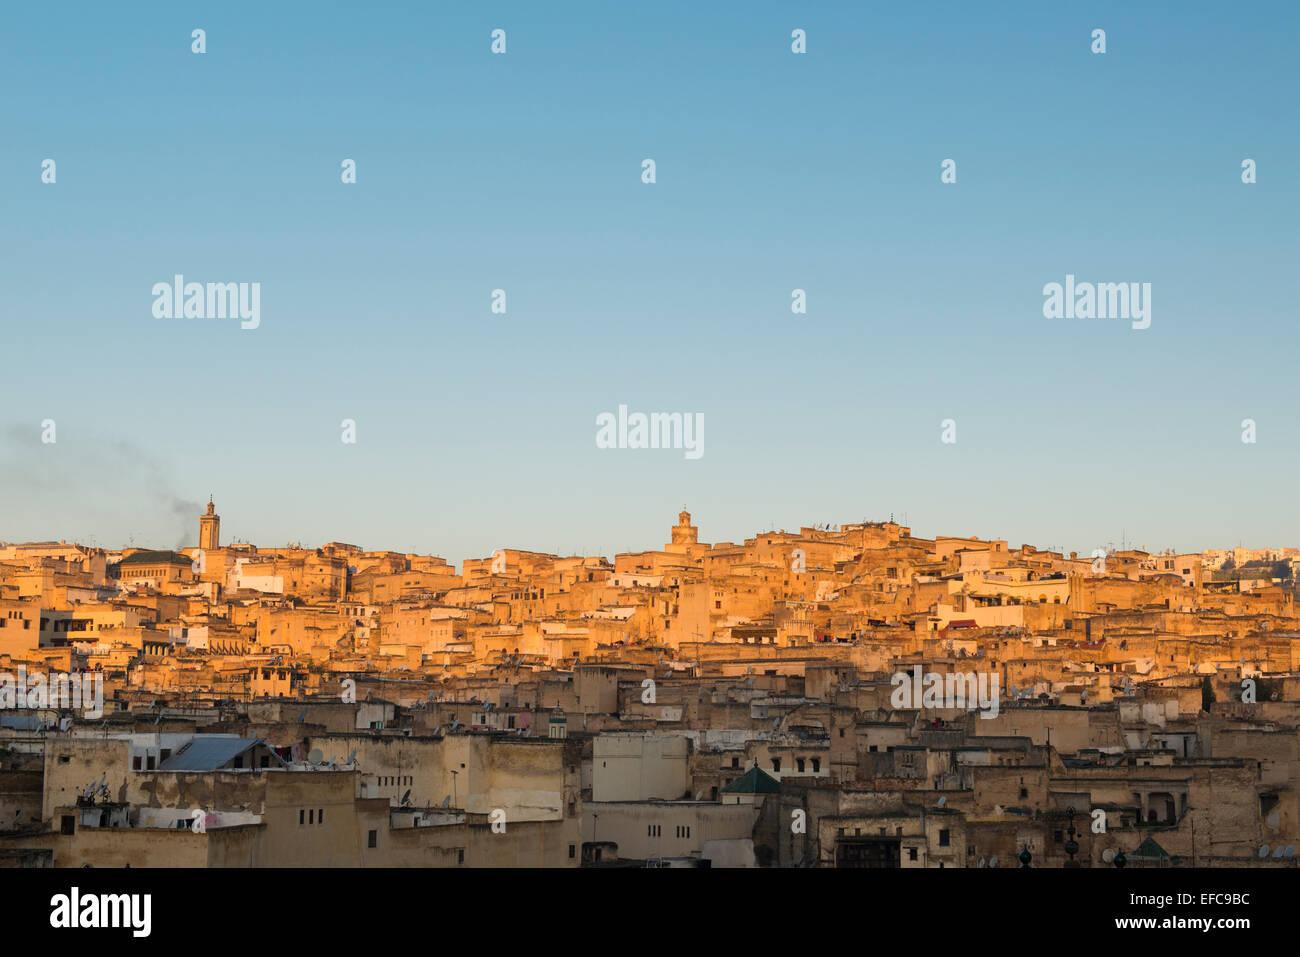 Fes at sunrise, Morocco - Stock Image